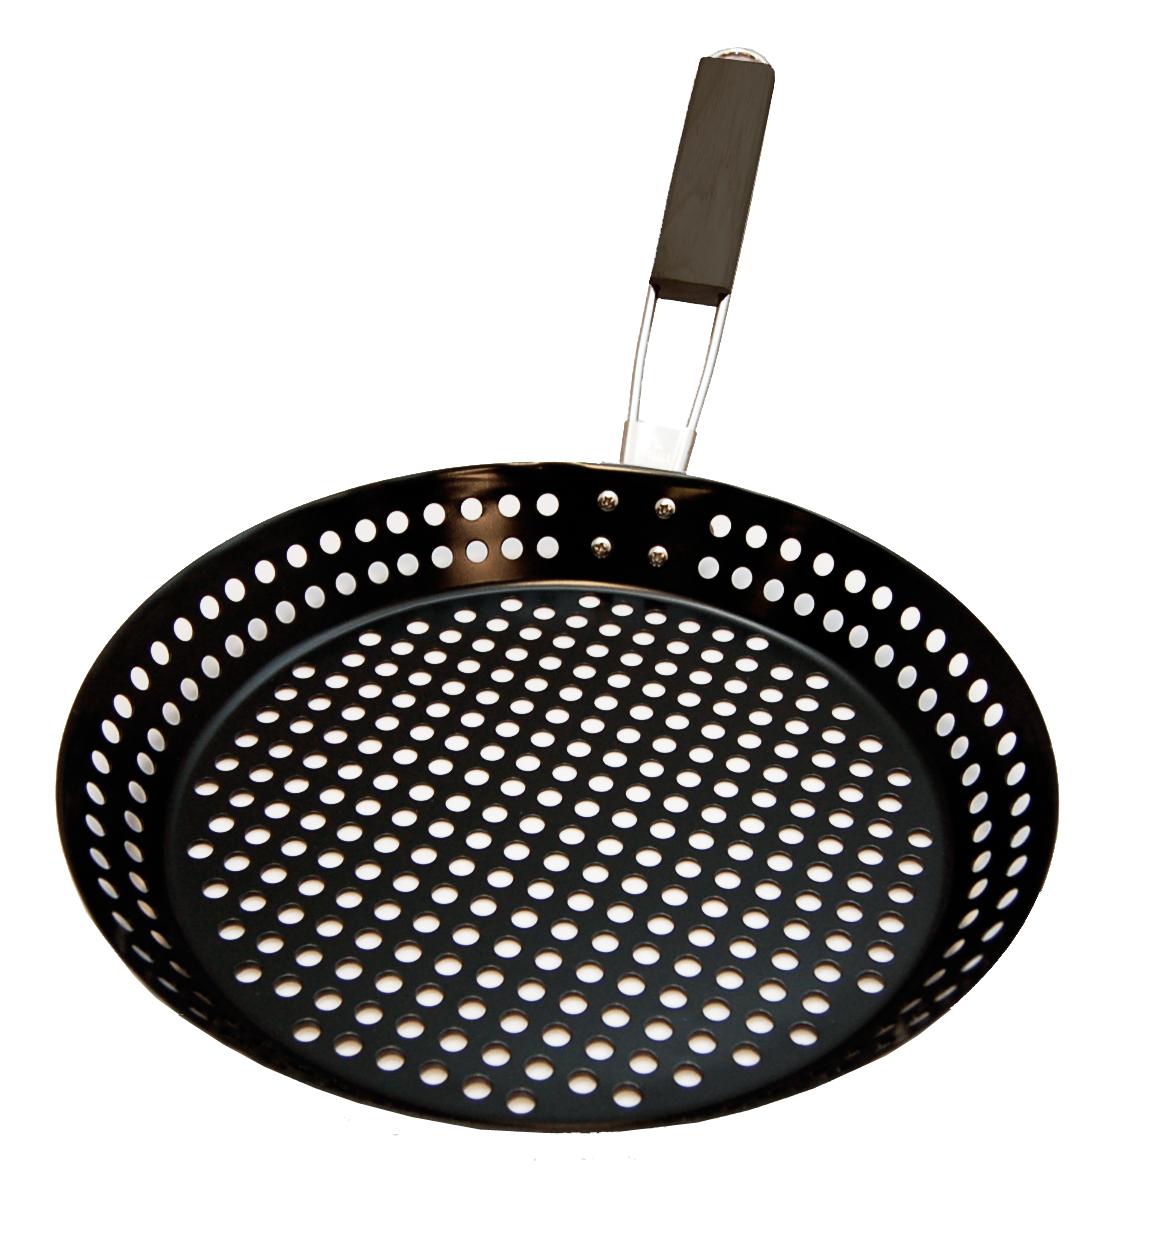 Image of   Grill stegepande med huller